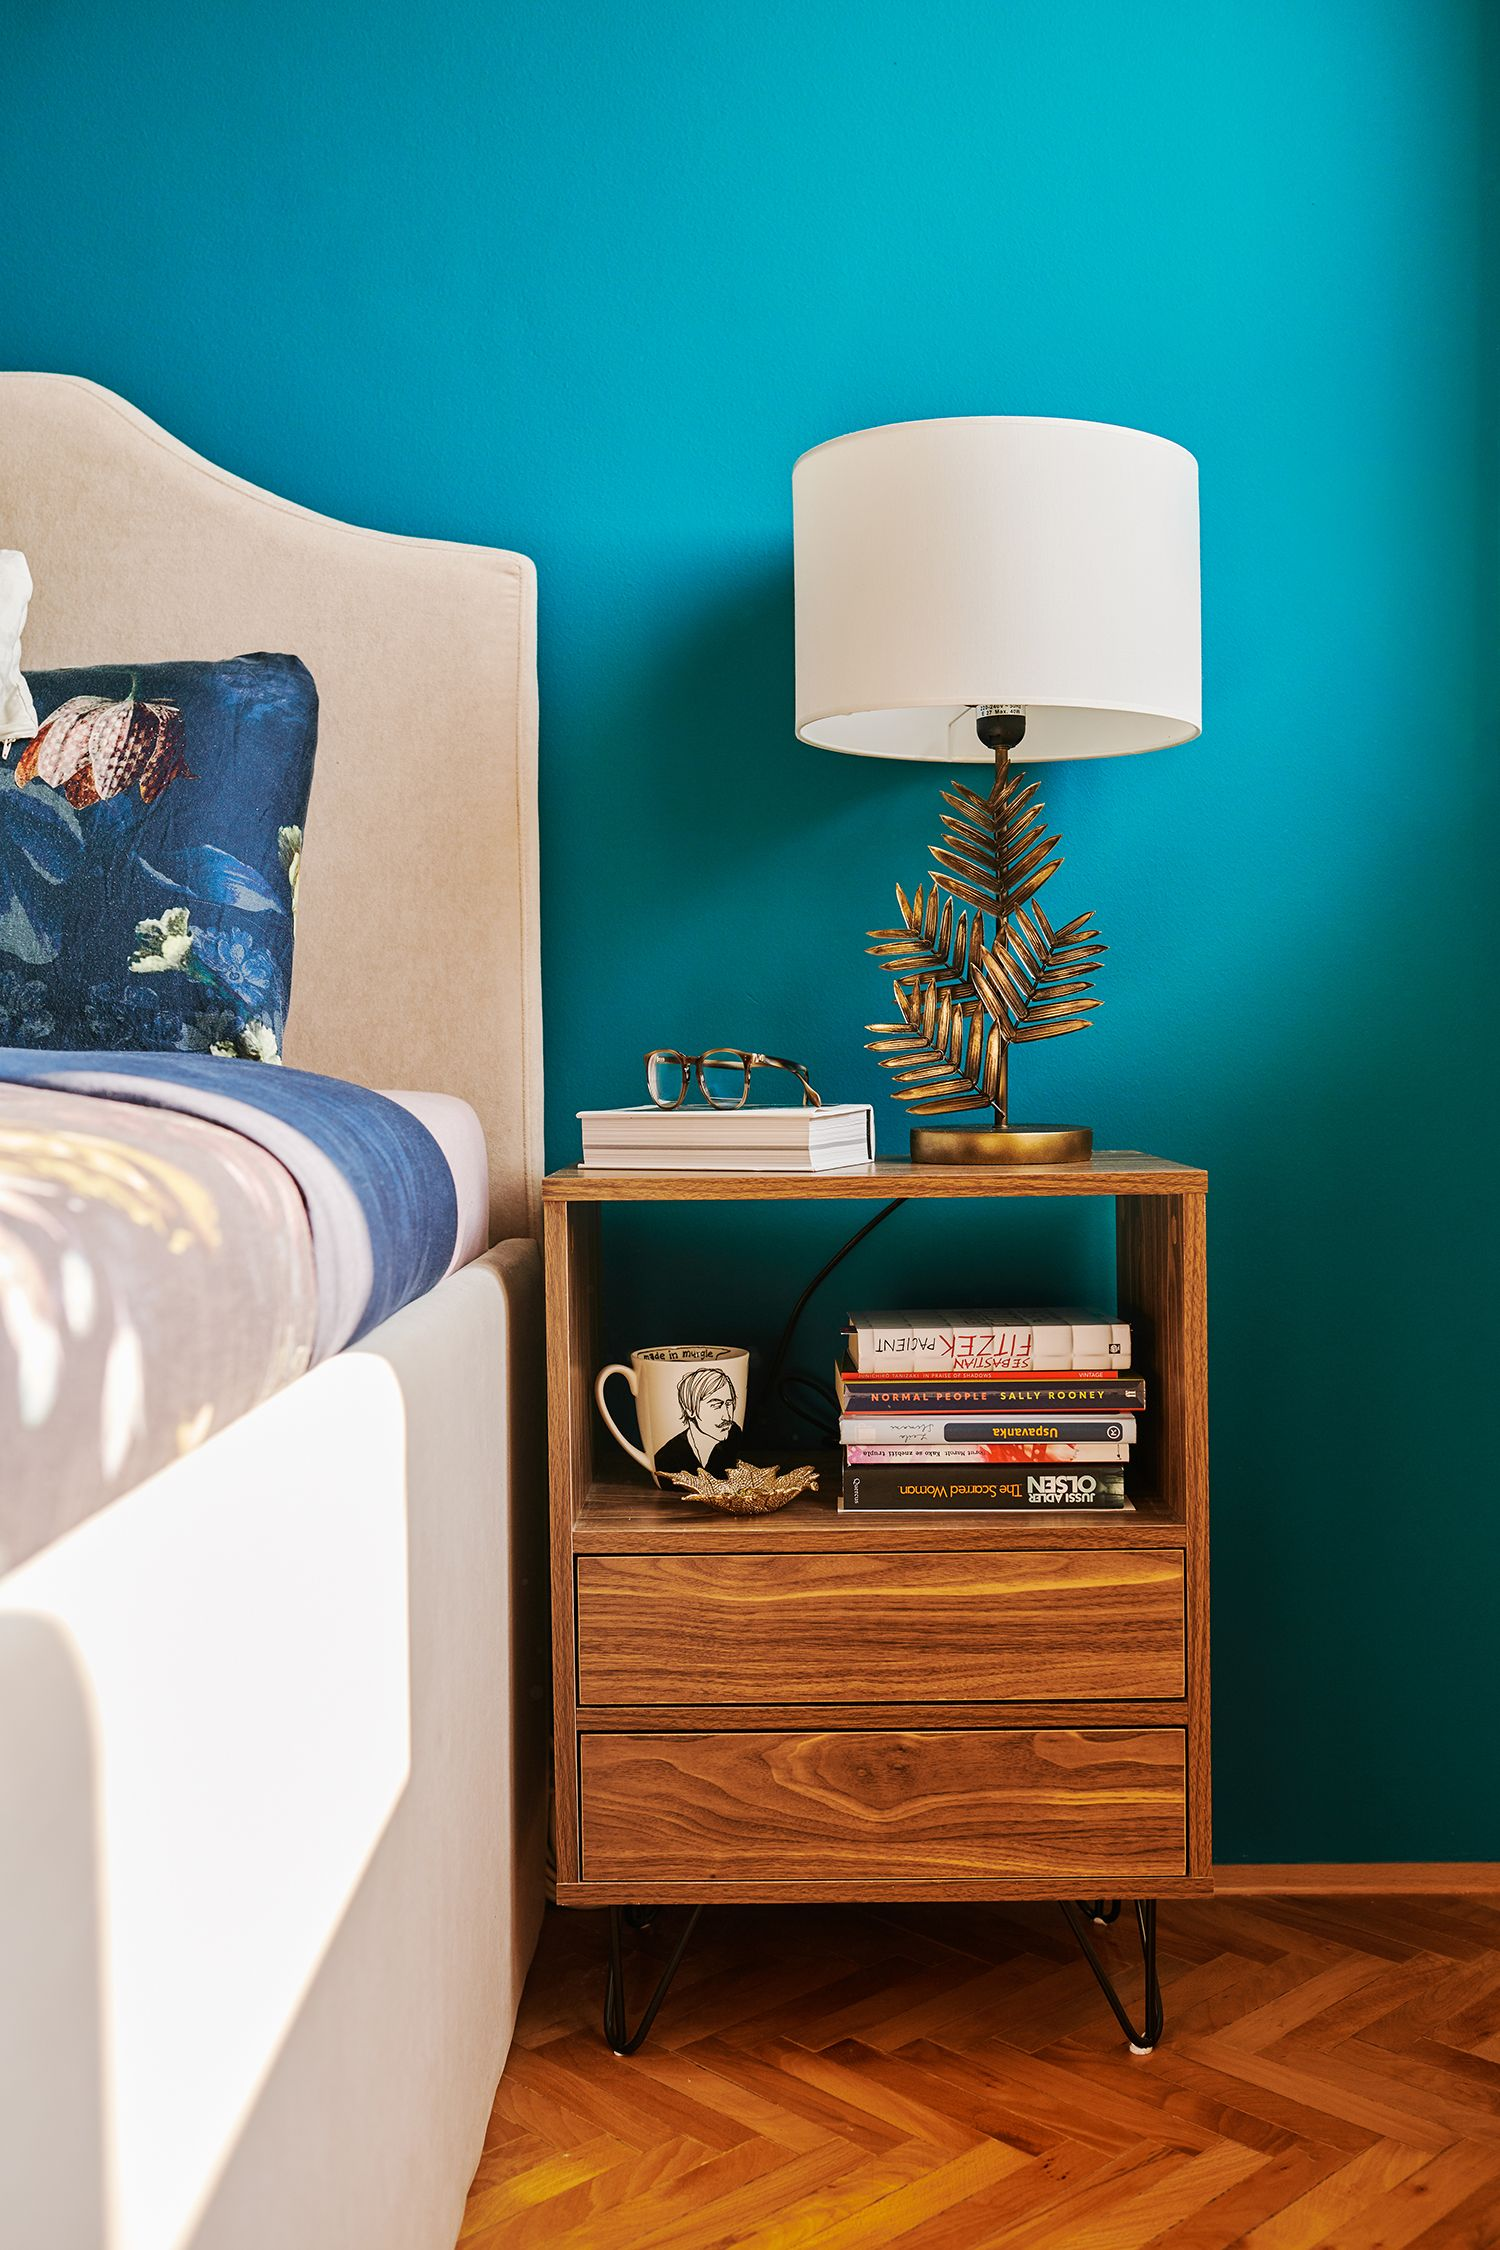 Best Midcentury Modern Bedroom With Bespoke Bed Frame In 2020 400 x 300